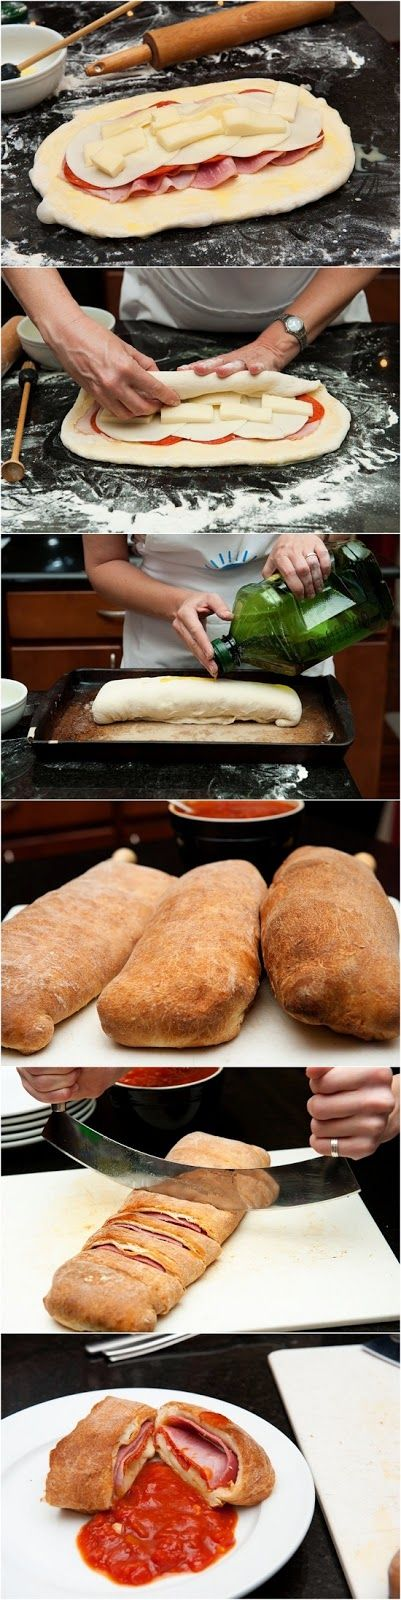 Delicioso Stromboli preparado con jamón, queso mozarella y peperoni